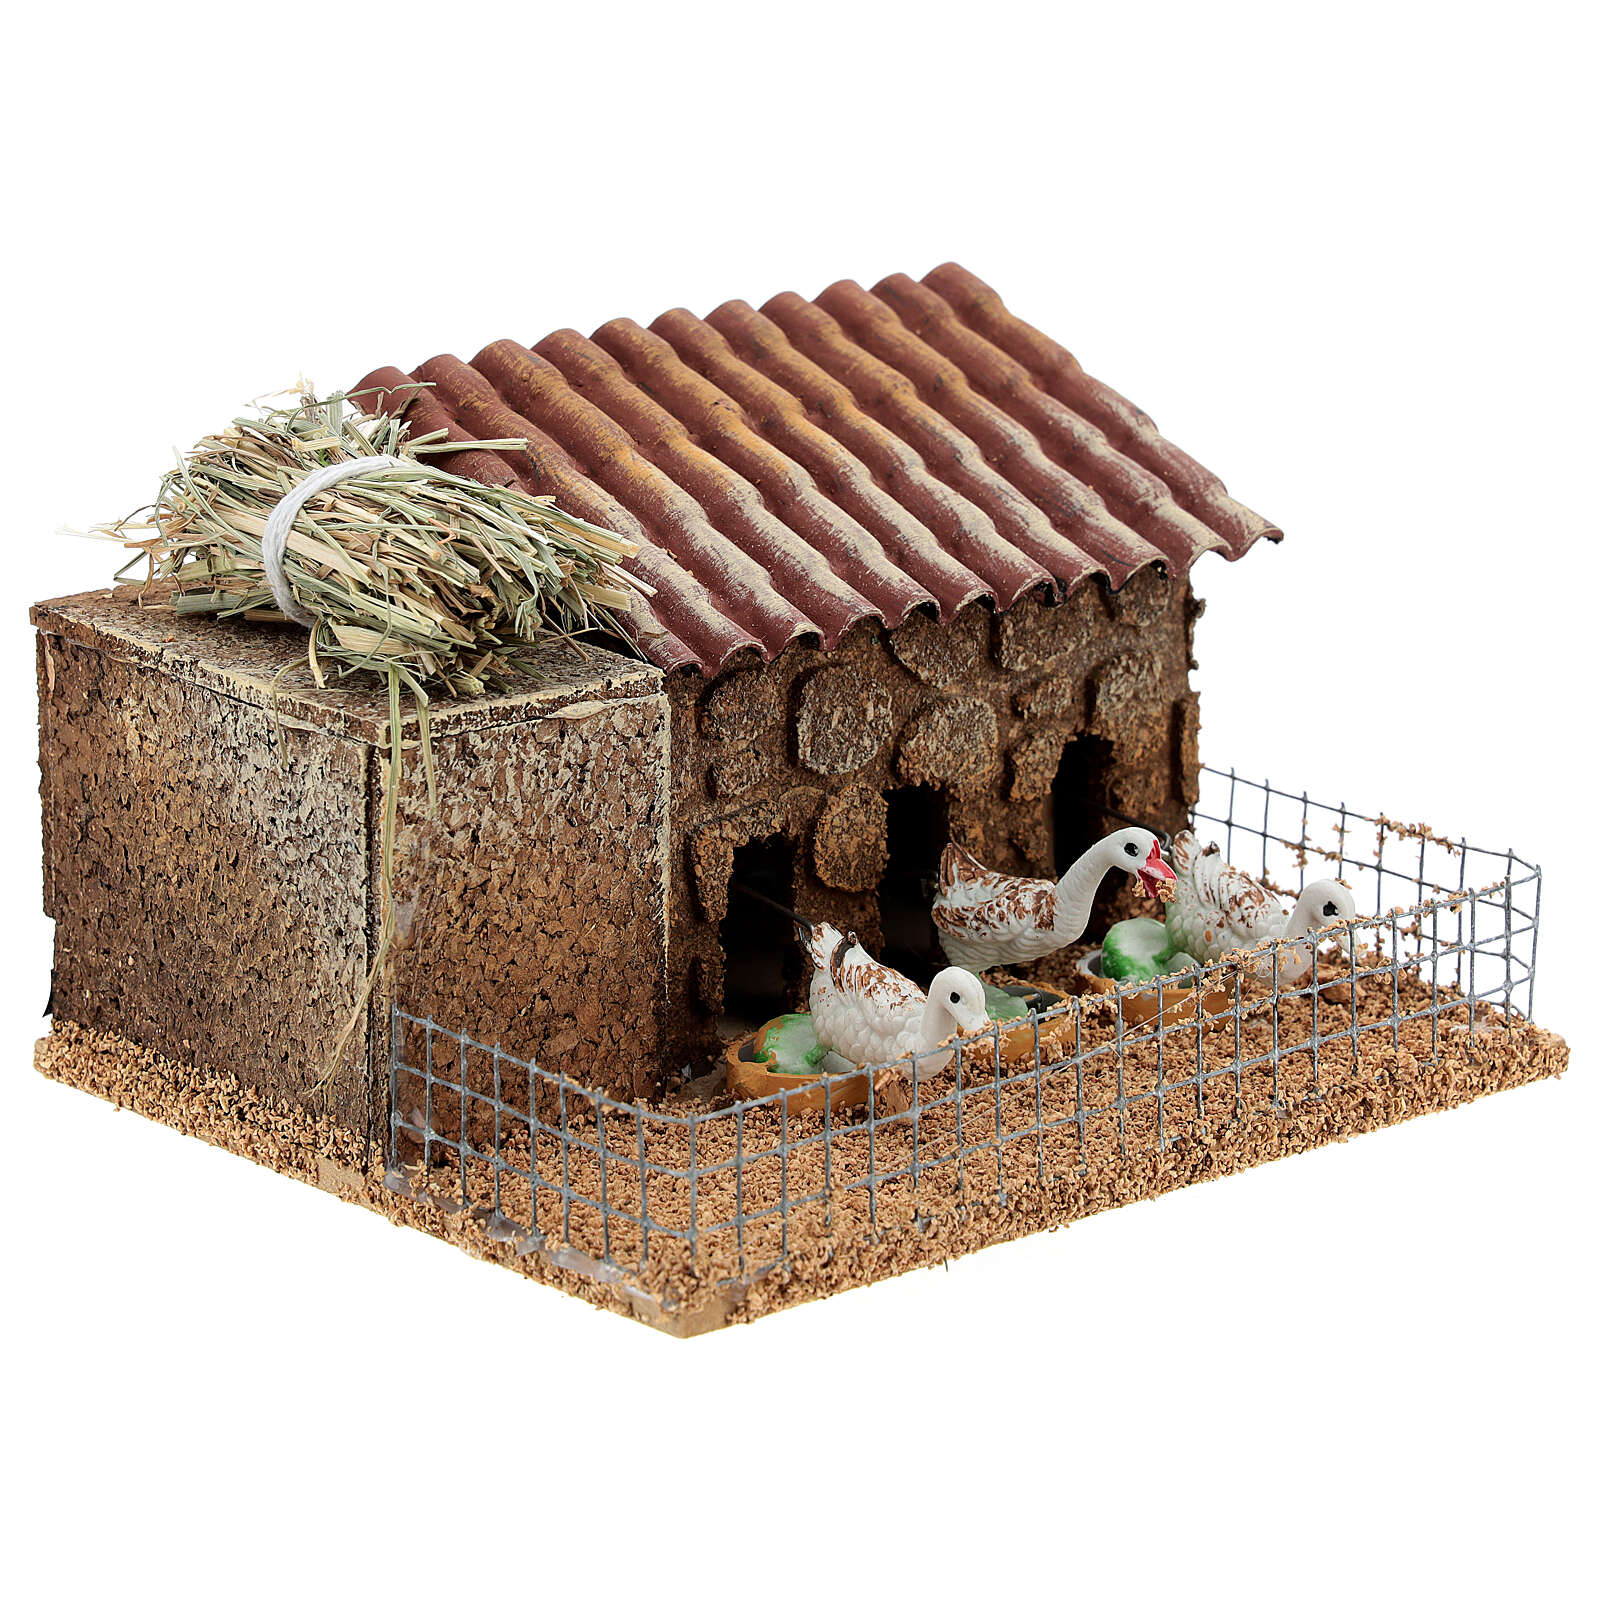 Patos era belén 10-12 cm 10x15x10 cm movimiento 3